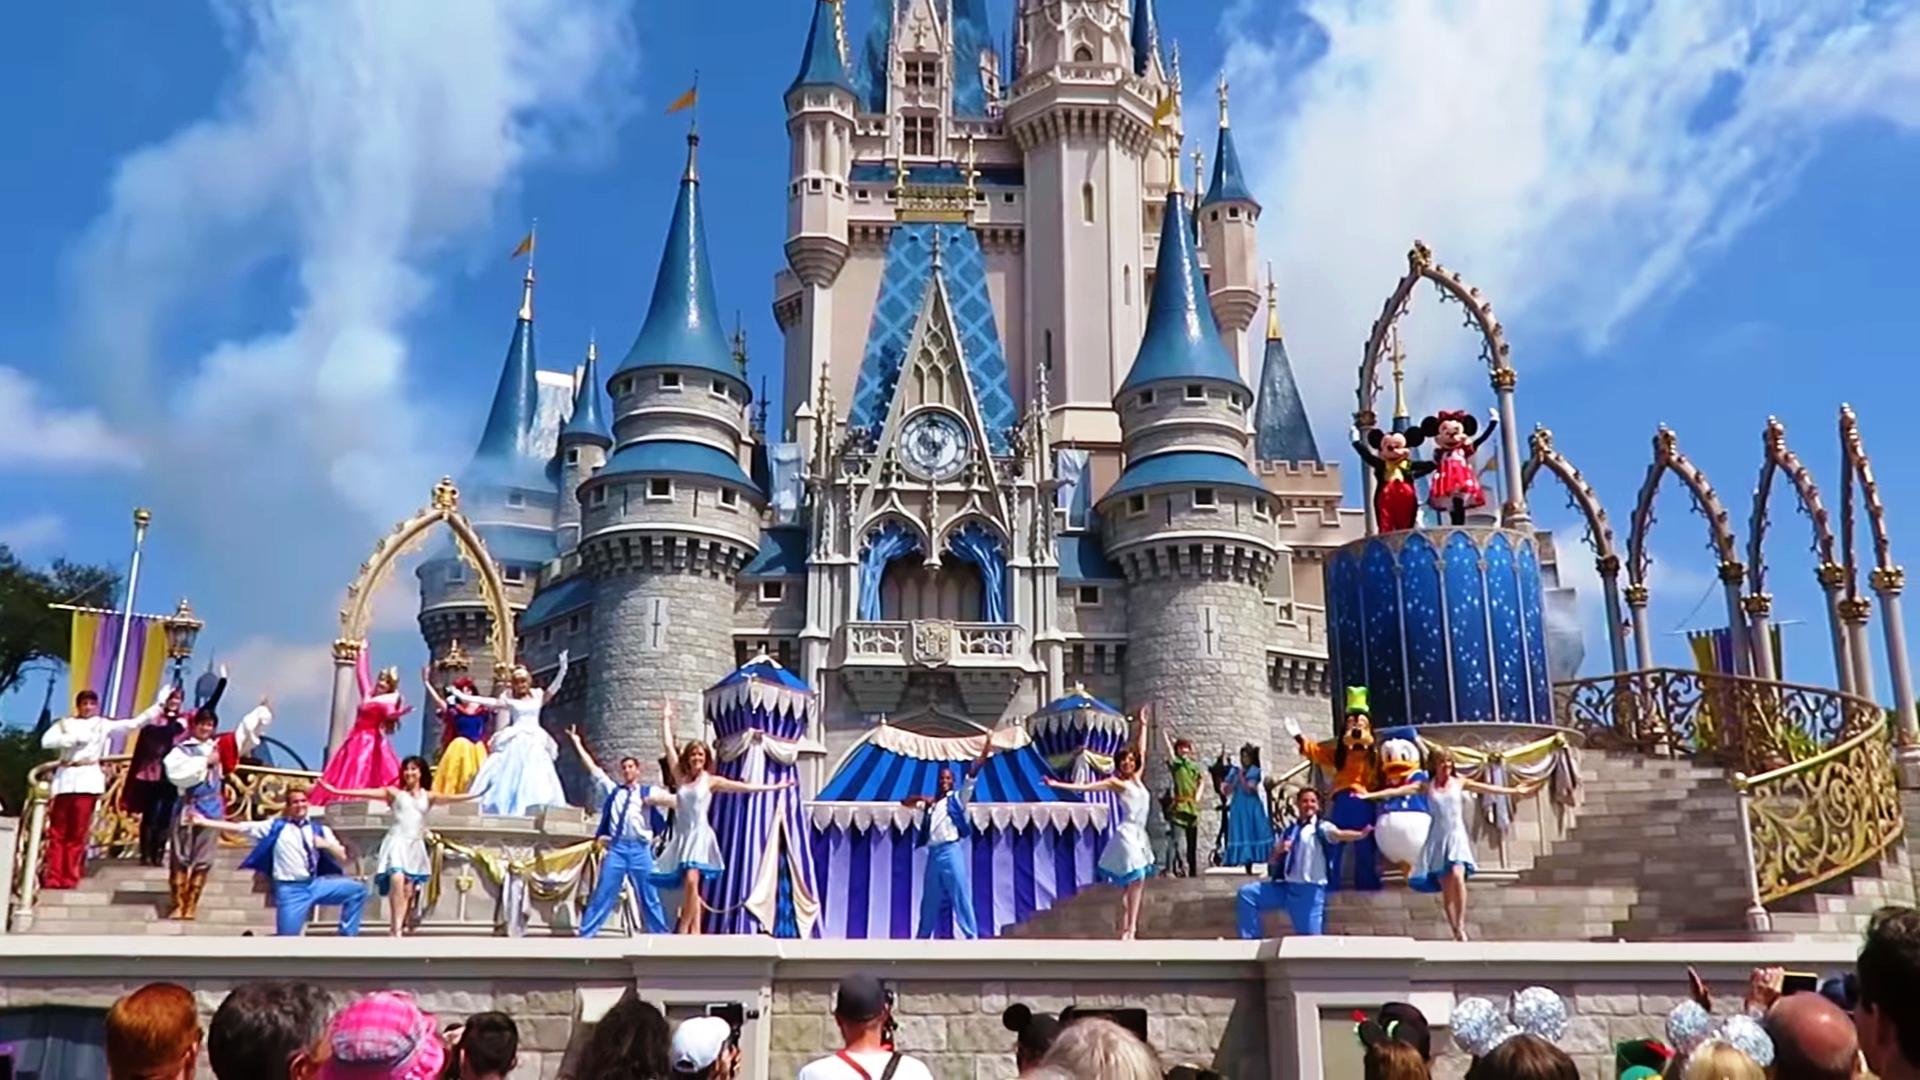 Welcome To Wdwnewscom! Home Of Everything Walt Disney - HD1920×1080